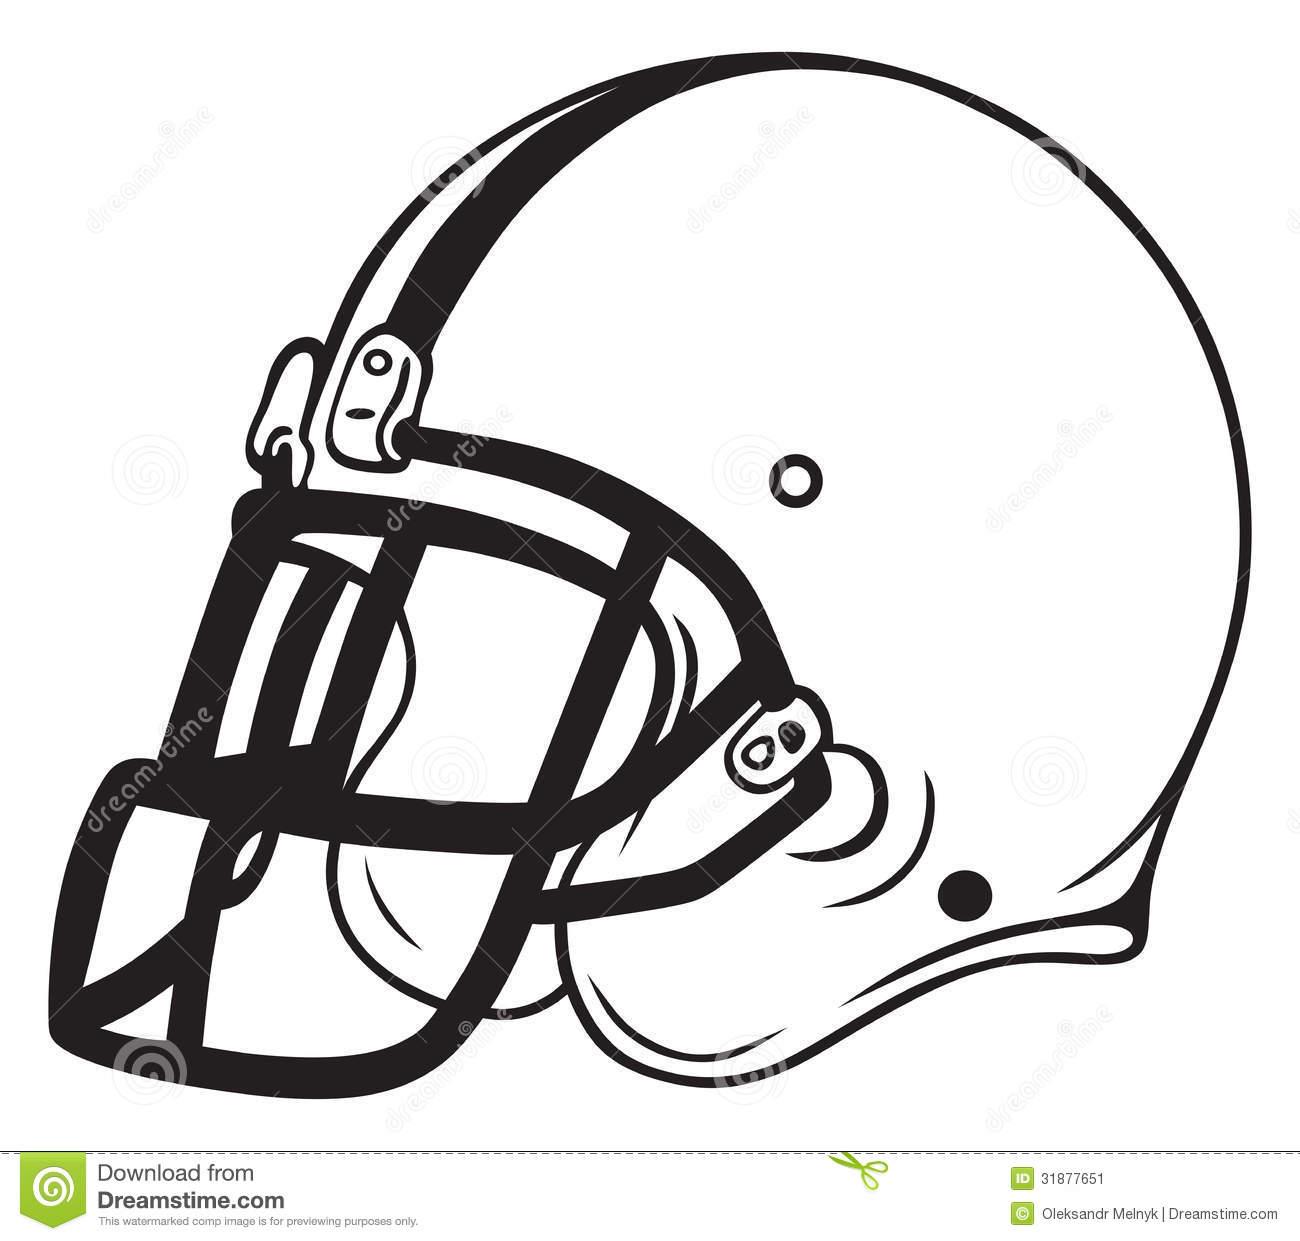 Free Clipart Football Helmet